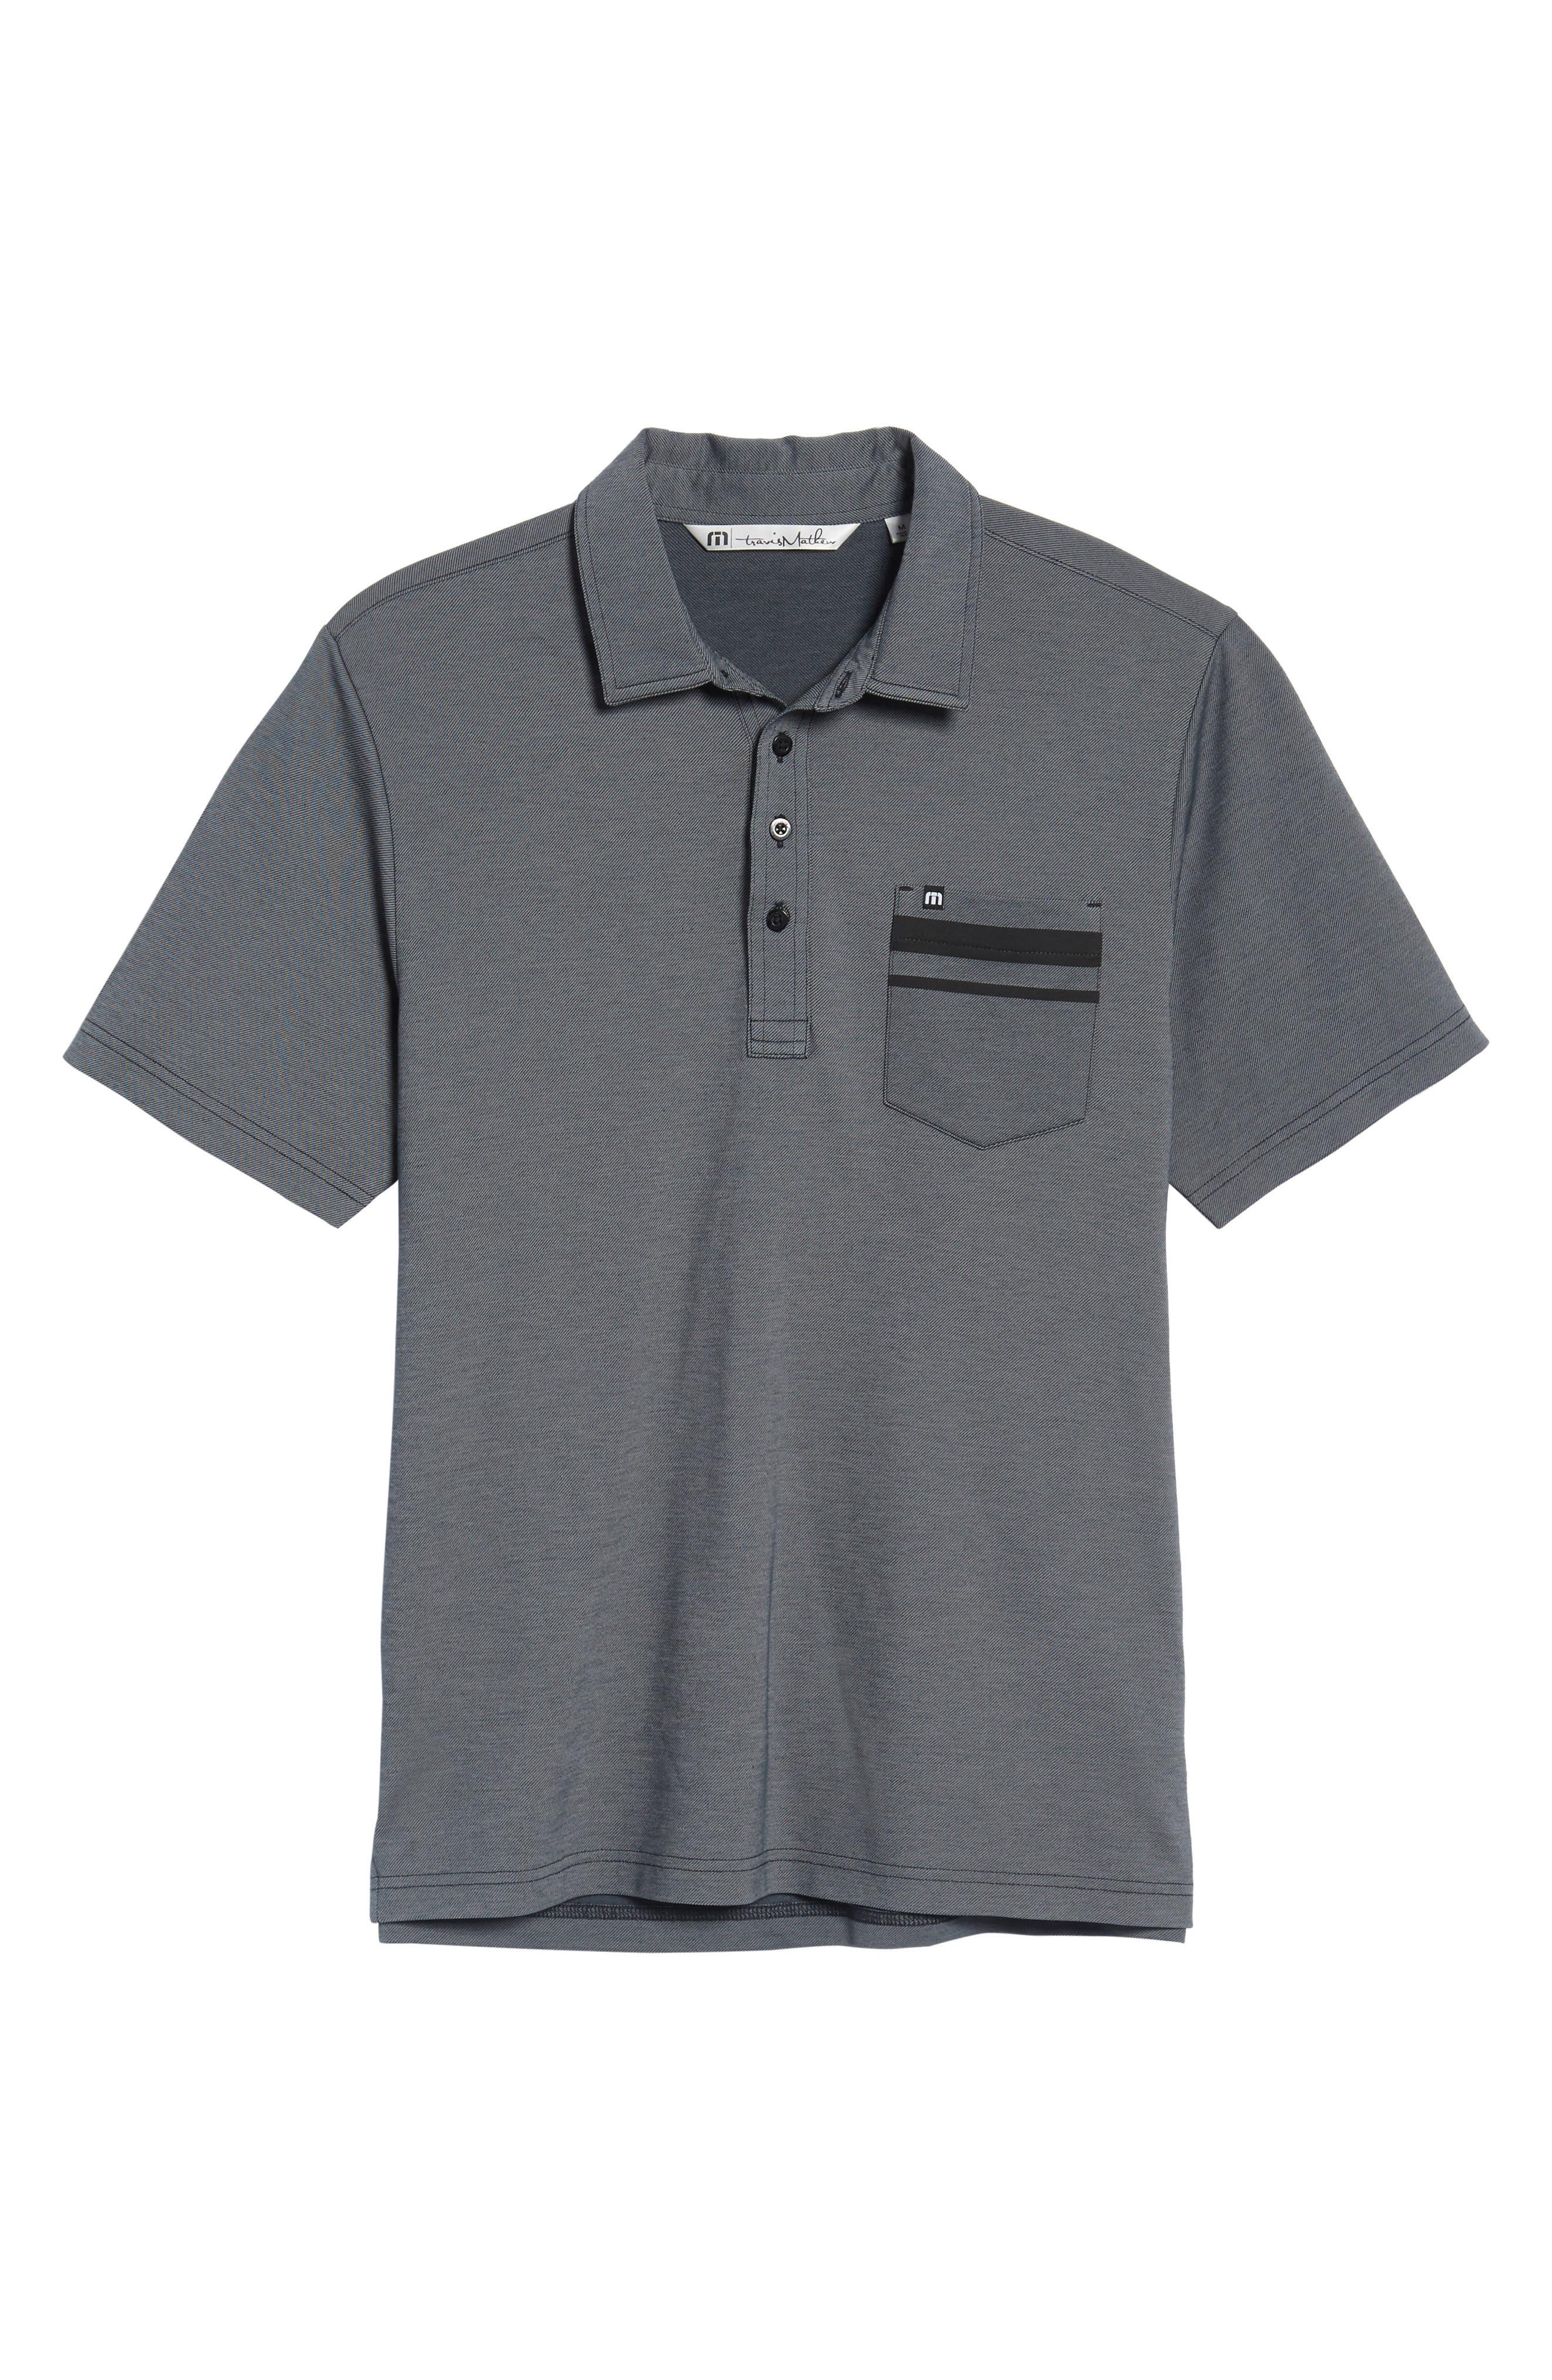 Hammond Piqué Polo,                             Alternate thumbnail 6, color,                             Black/ Sharkskin